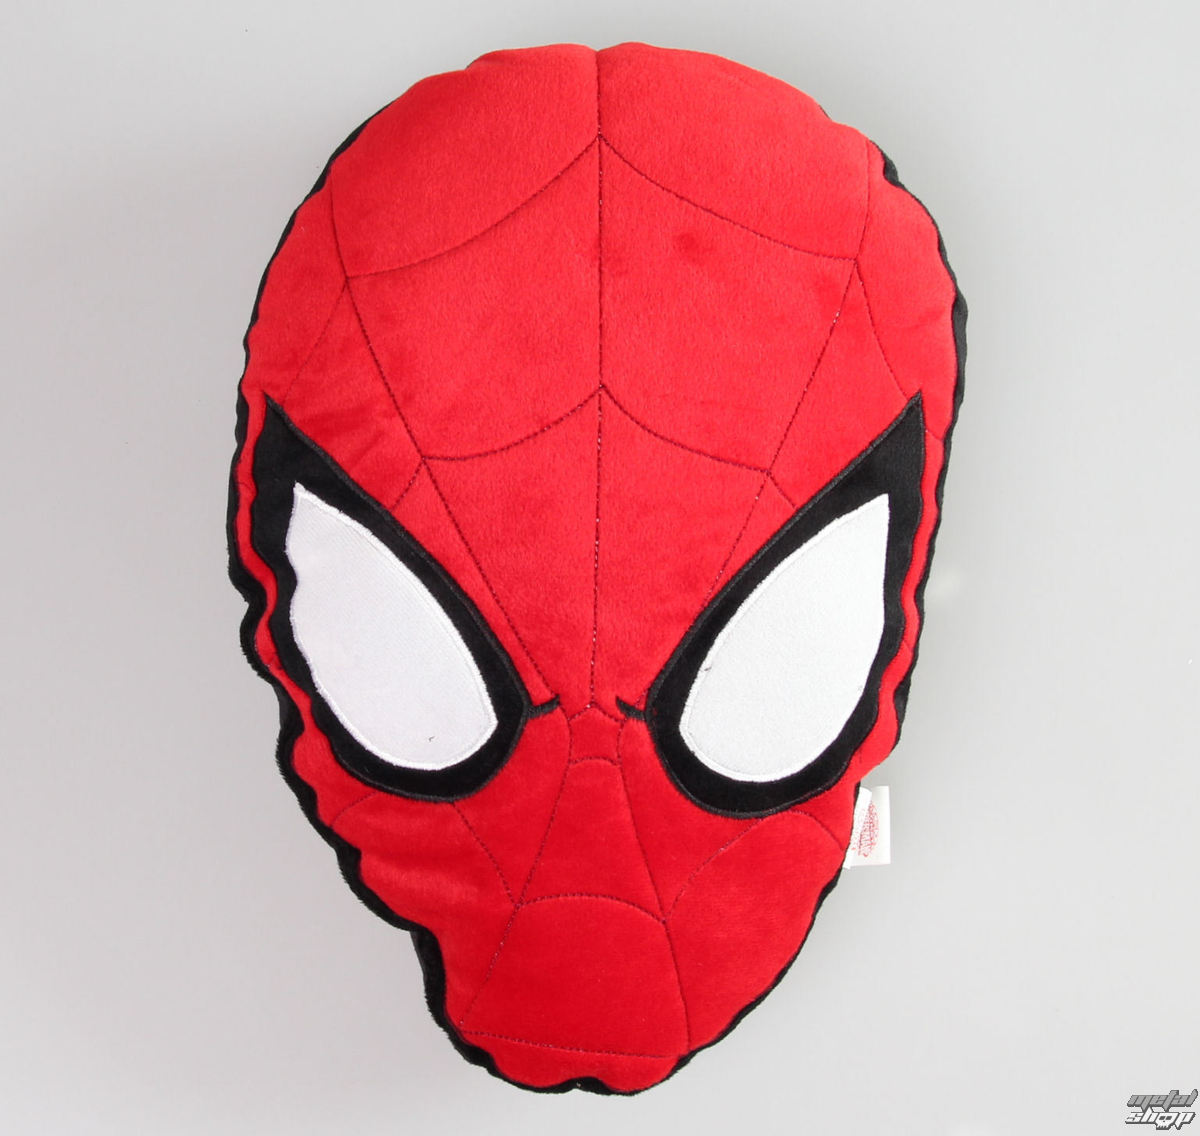 polštář Spiderman - The City - CRW33735